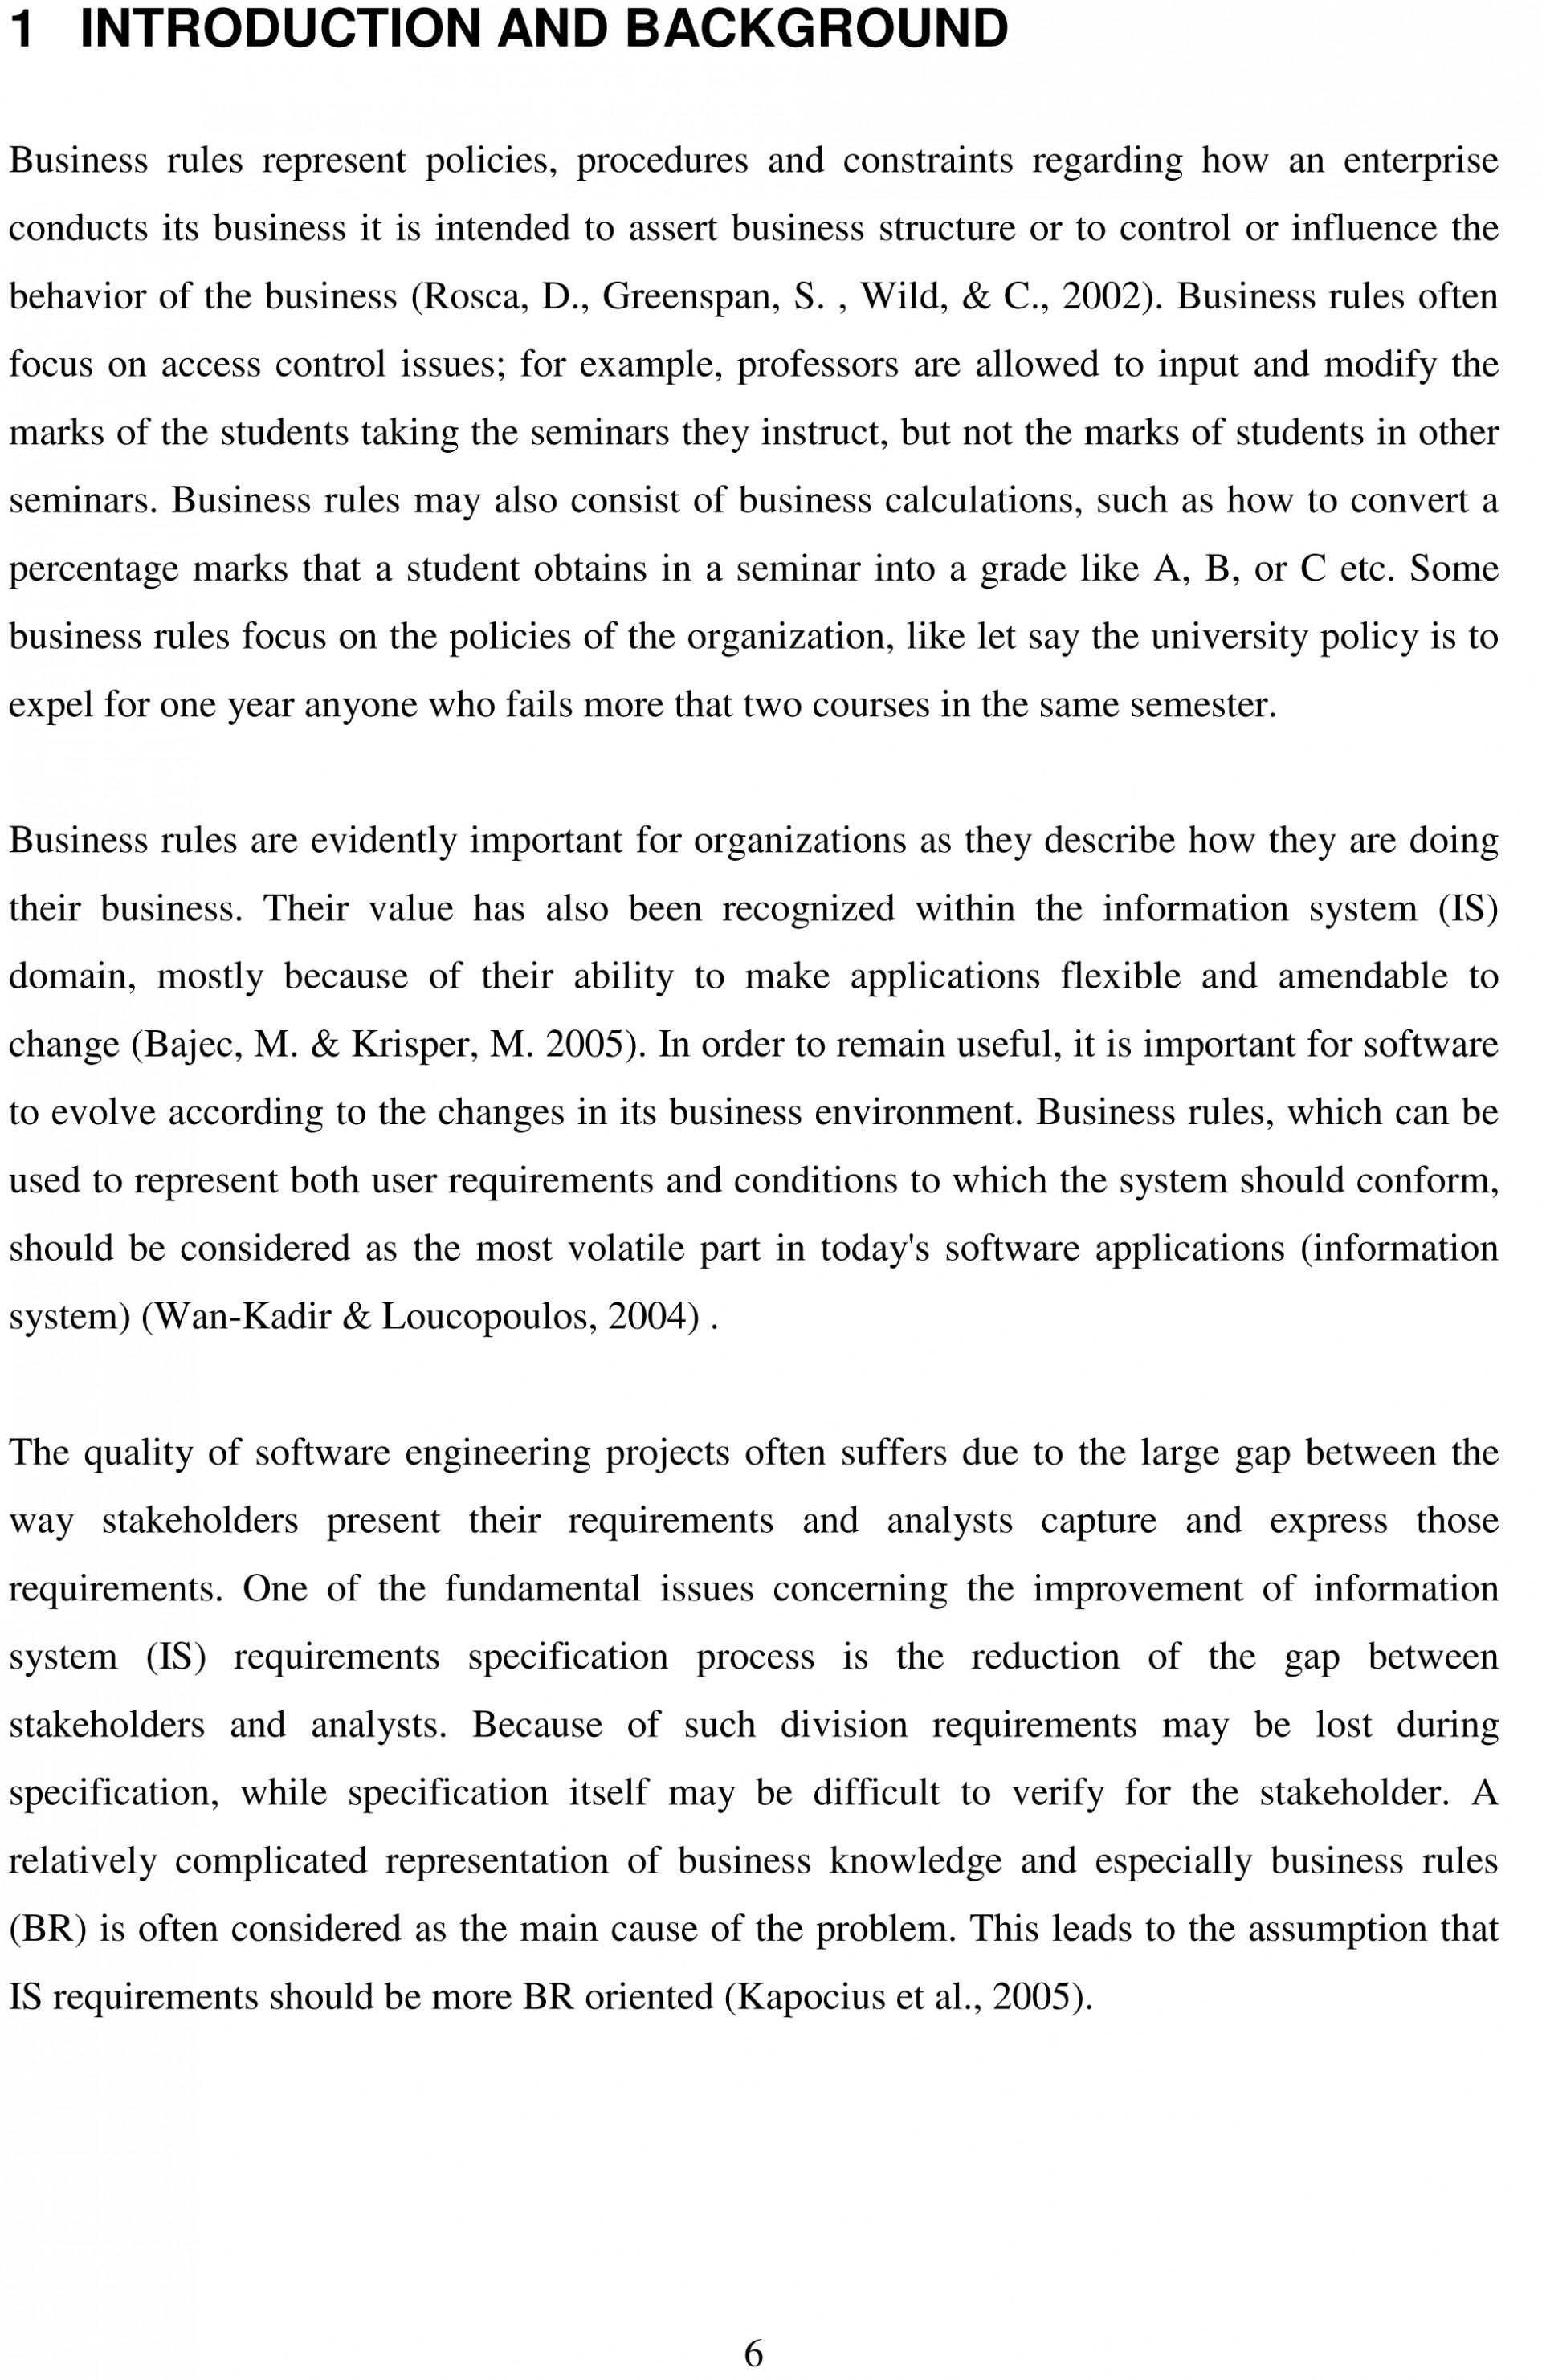 012 Essay Example Sample Act Essays Thesis Wonderful New 1920